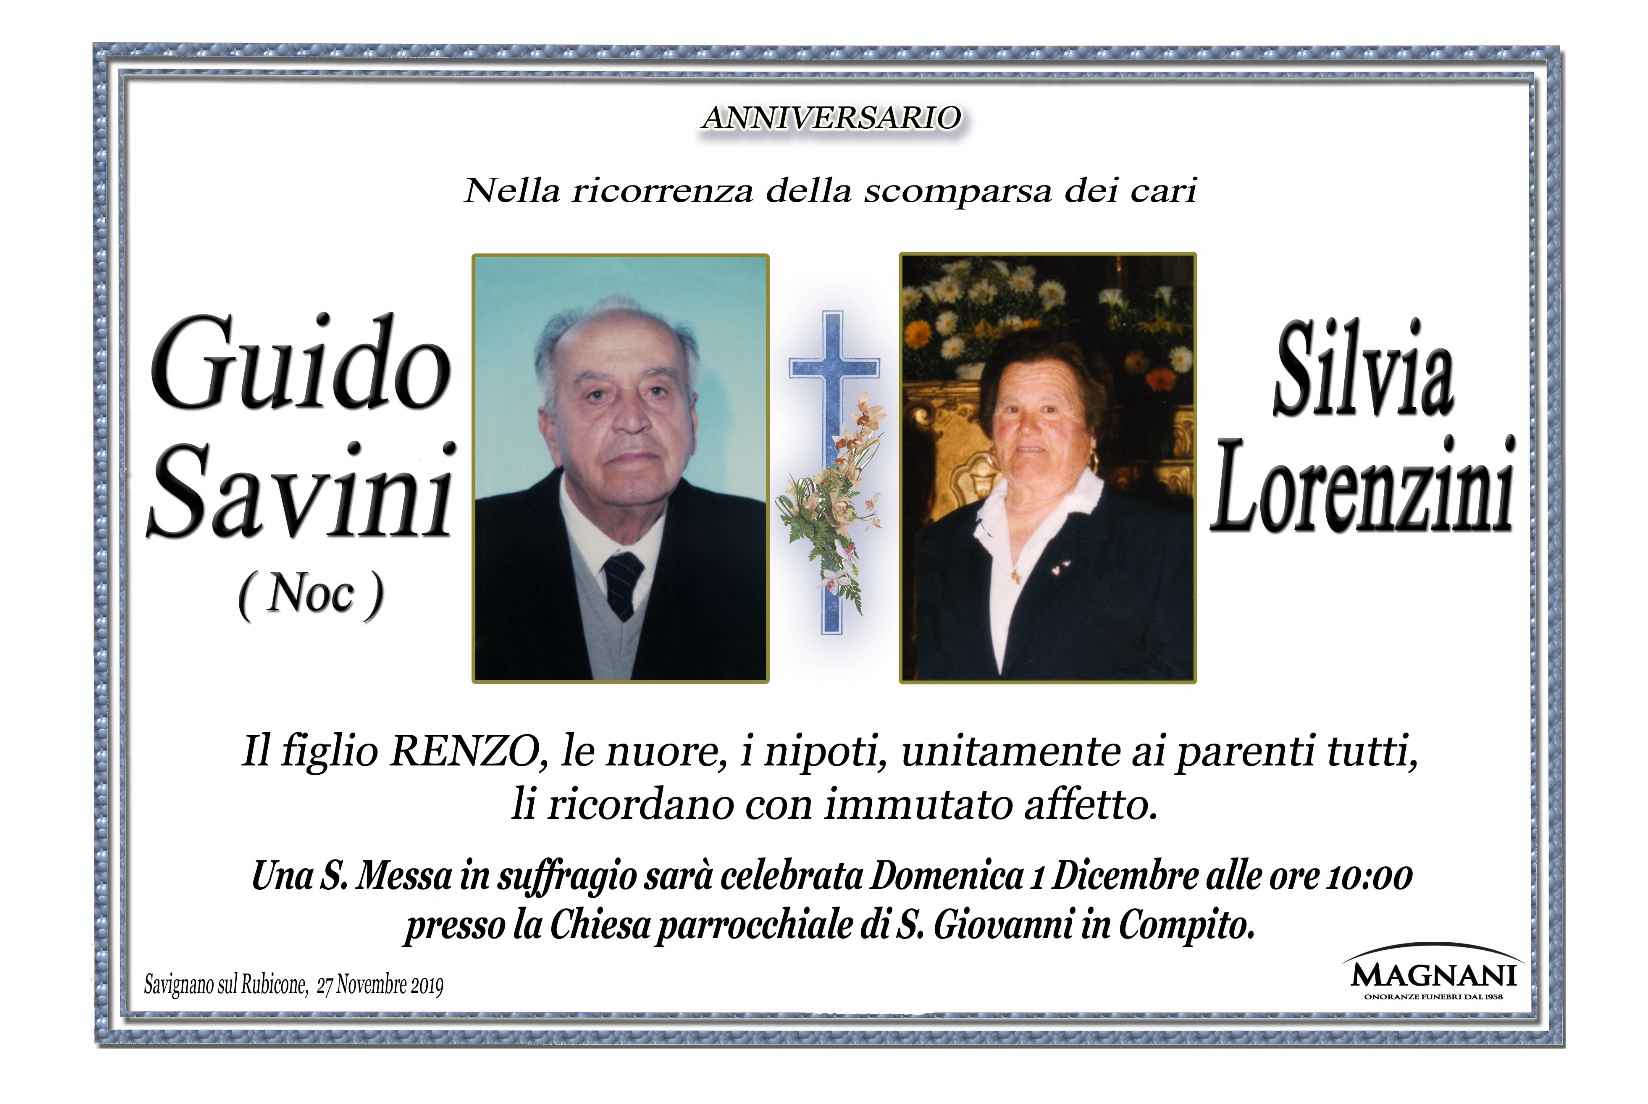 Anniversario Savini Lorenzini